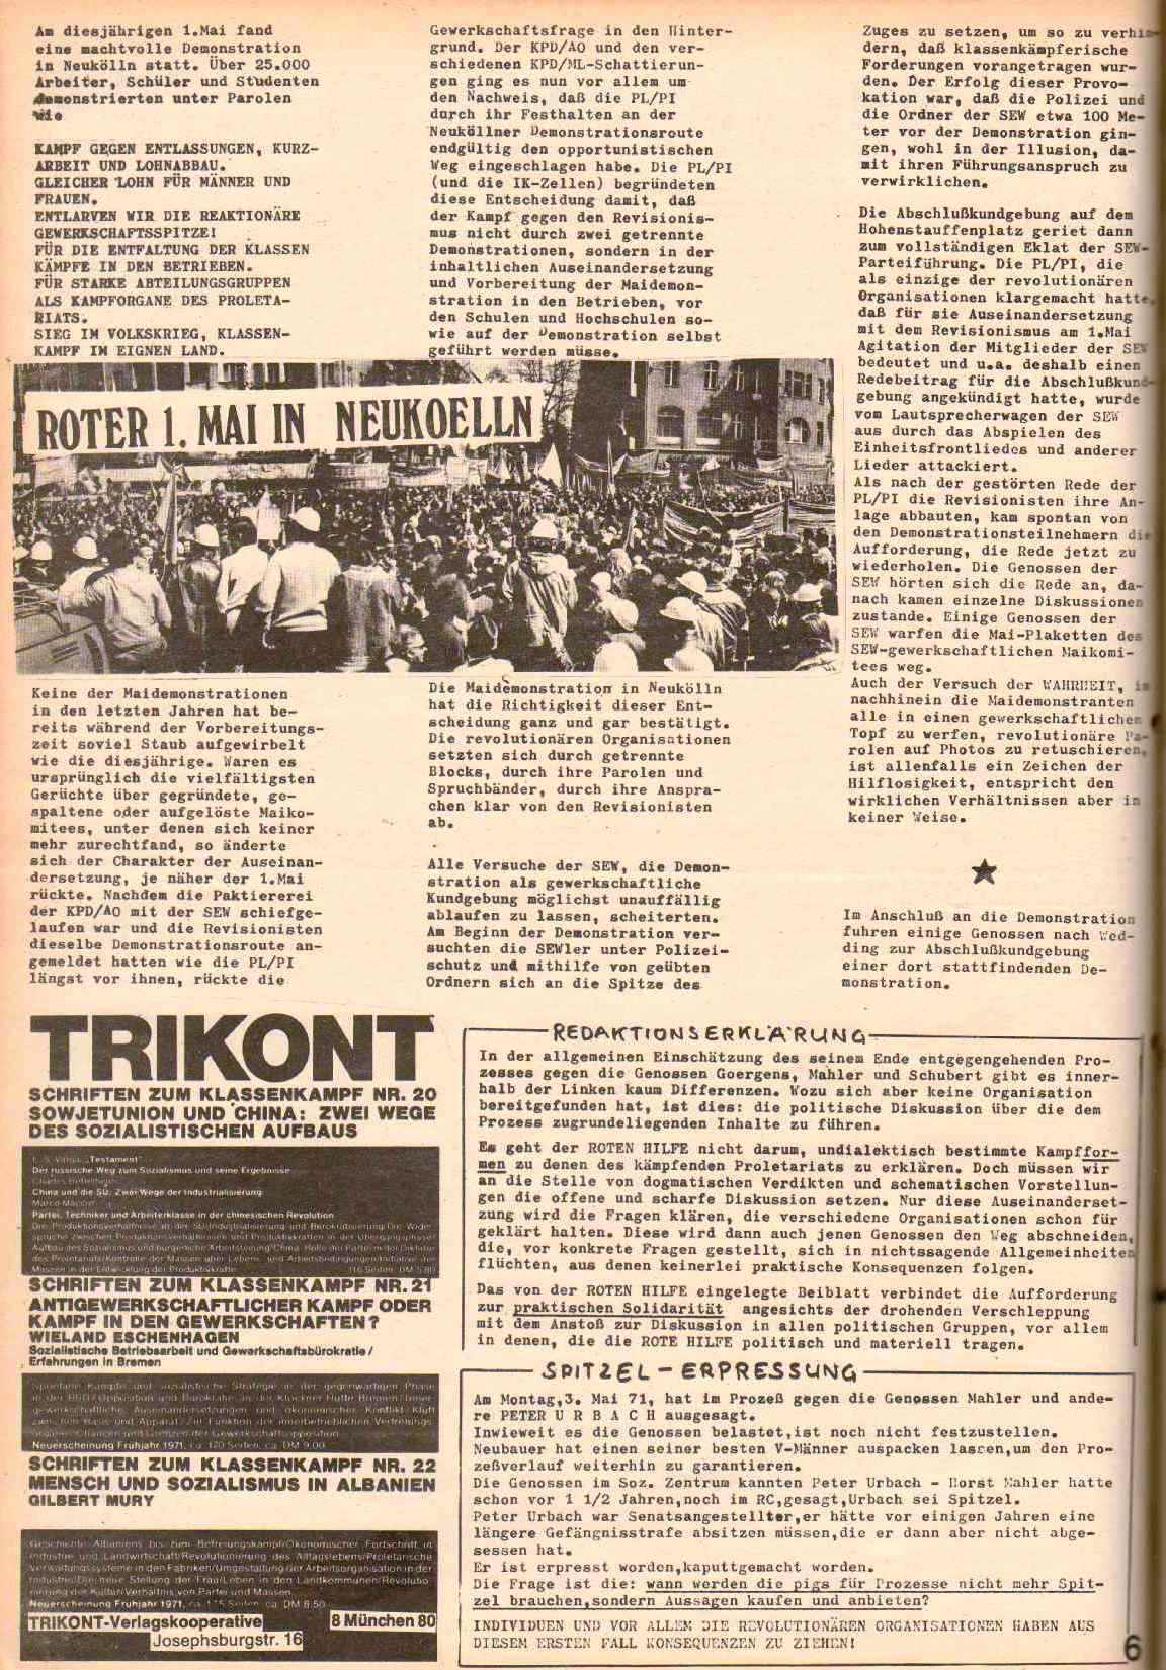 Berlin_Hochschulkampf_1971_08_06